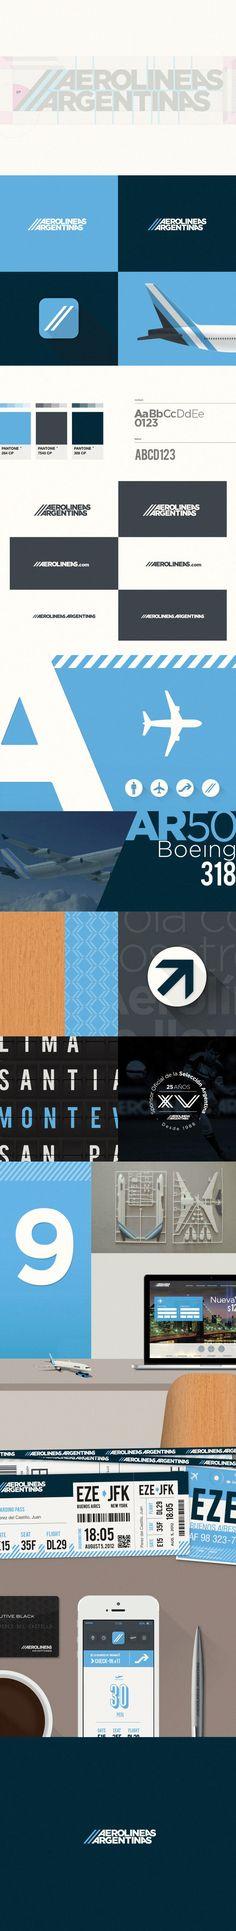 Aerolíneas Argentinas | Rebrand concept on Behance